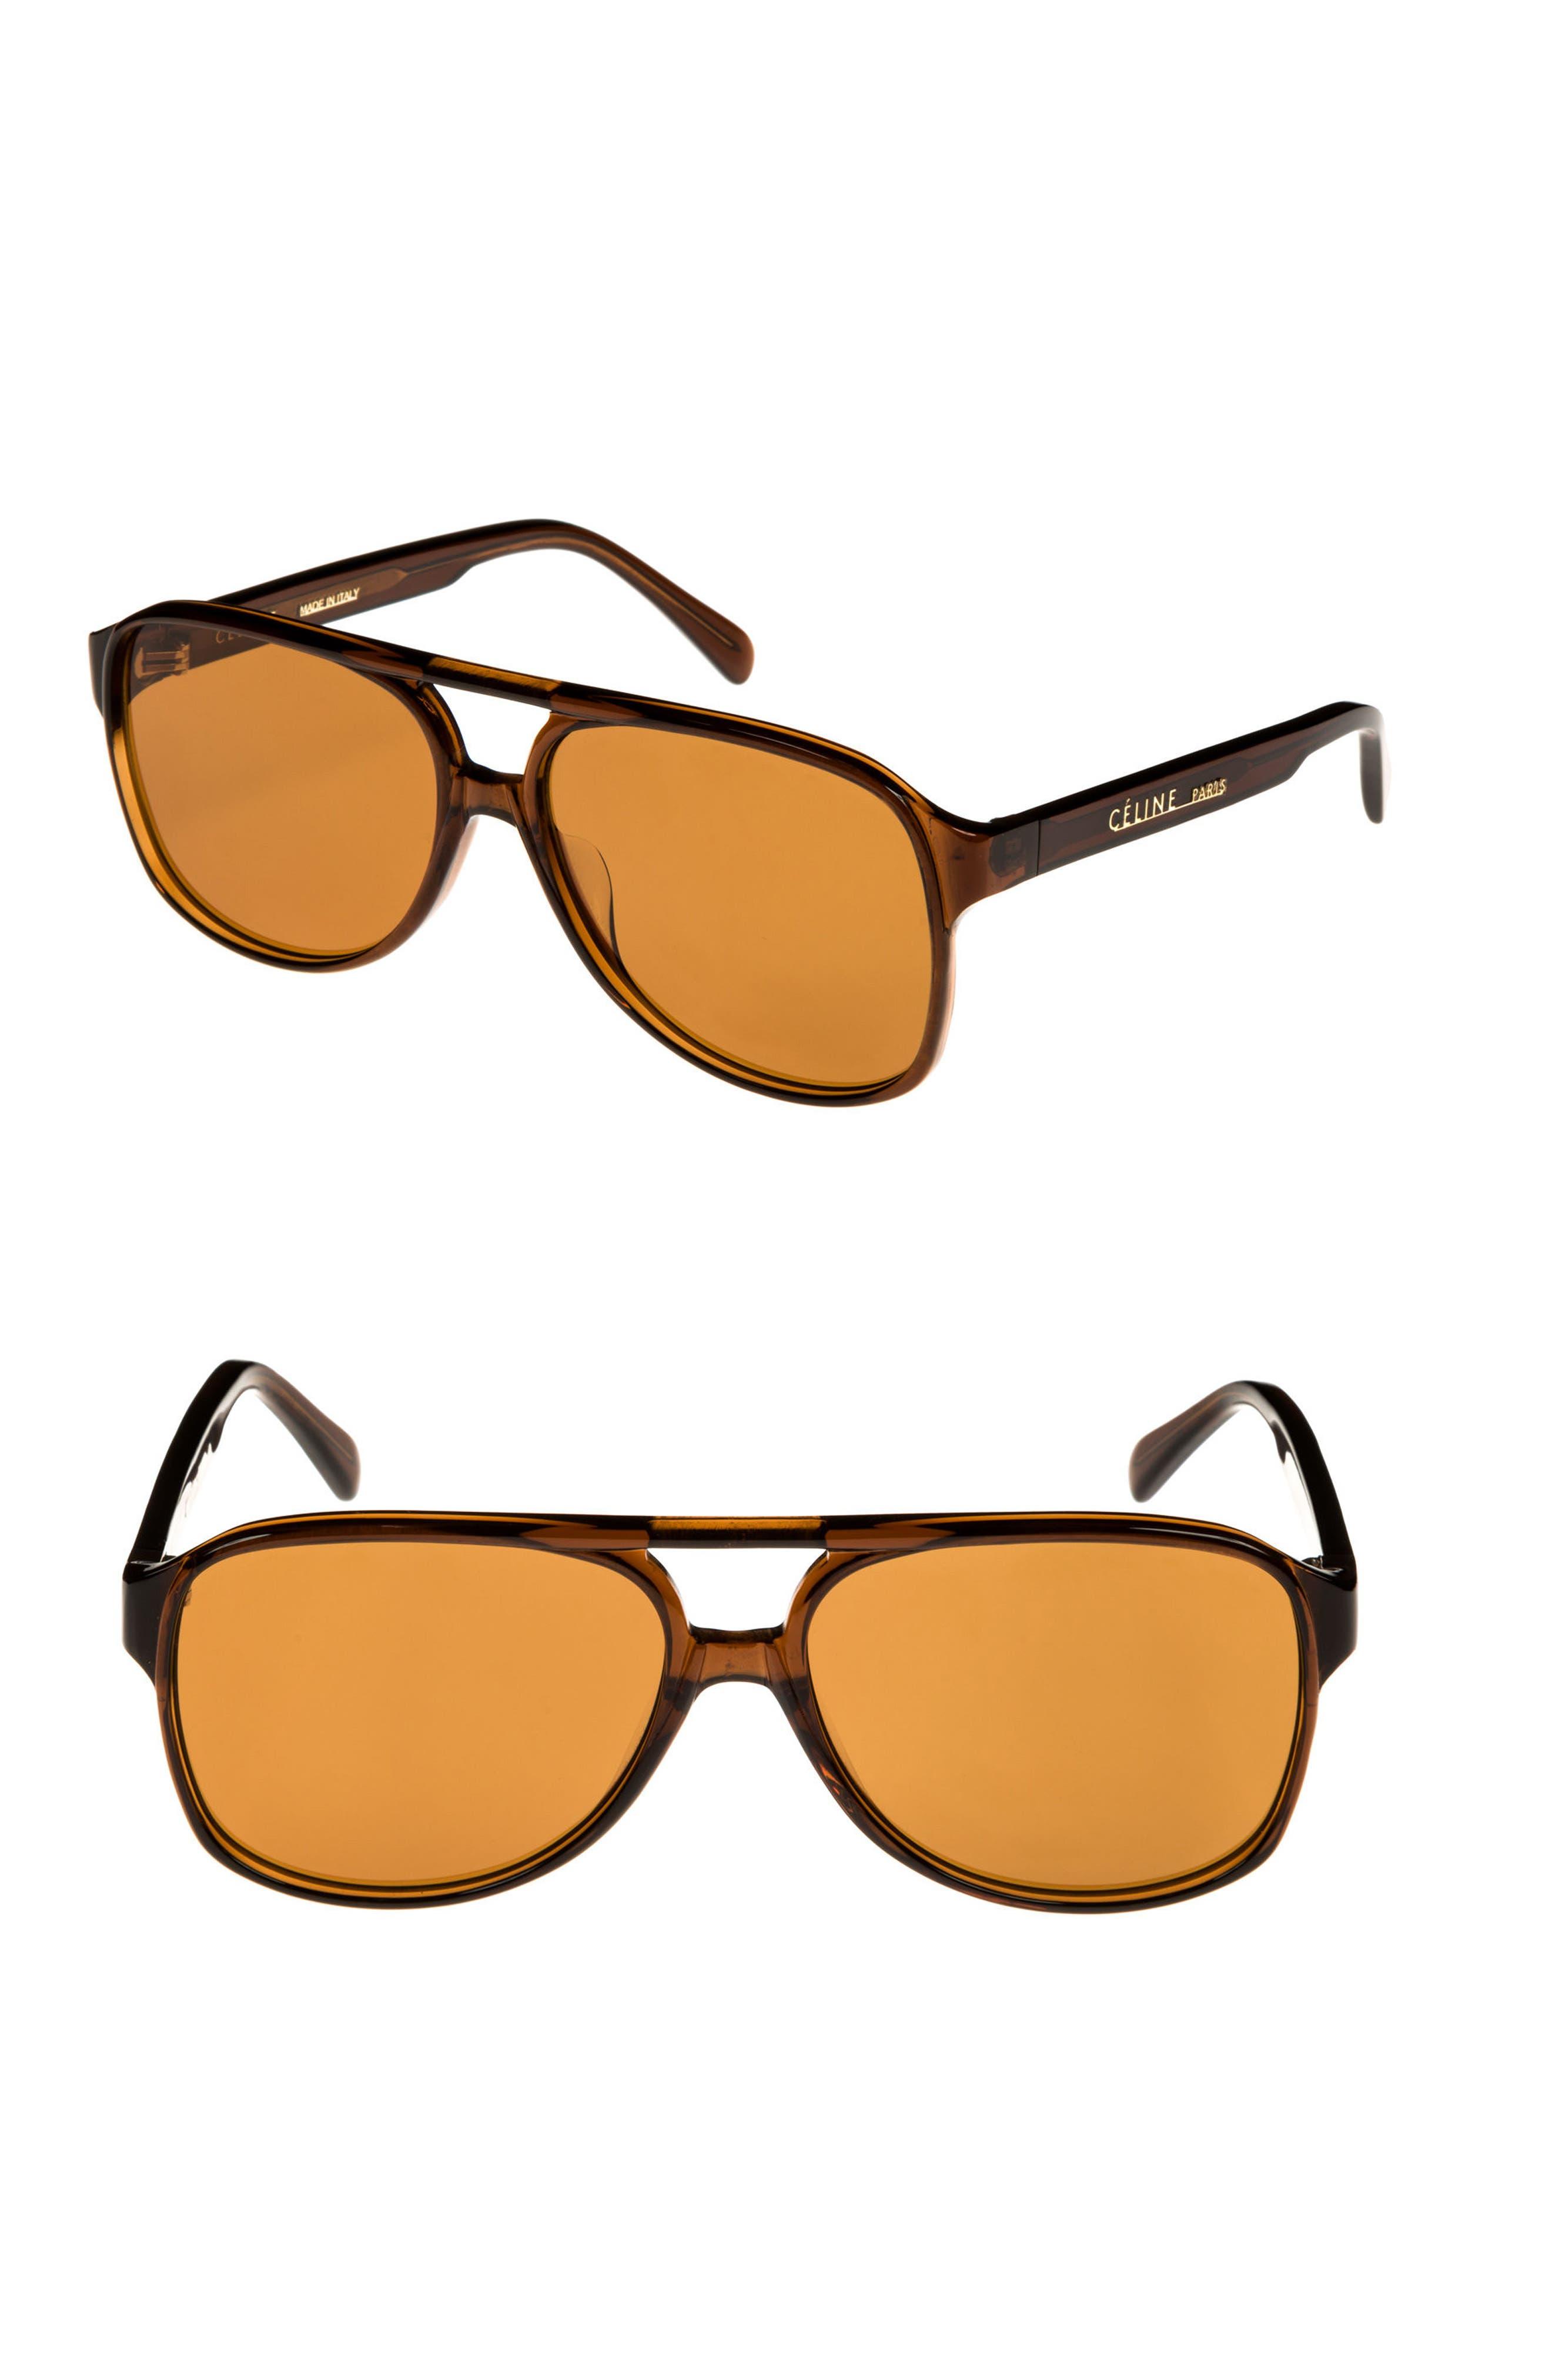 62mm Oversize Aviator Sunglasses,                             Main thumbnail 1, color,                             BROWN VINTAGE